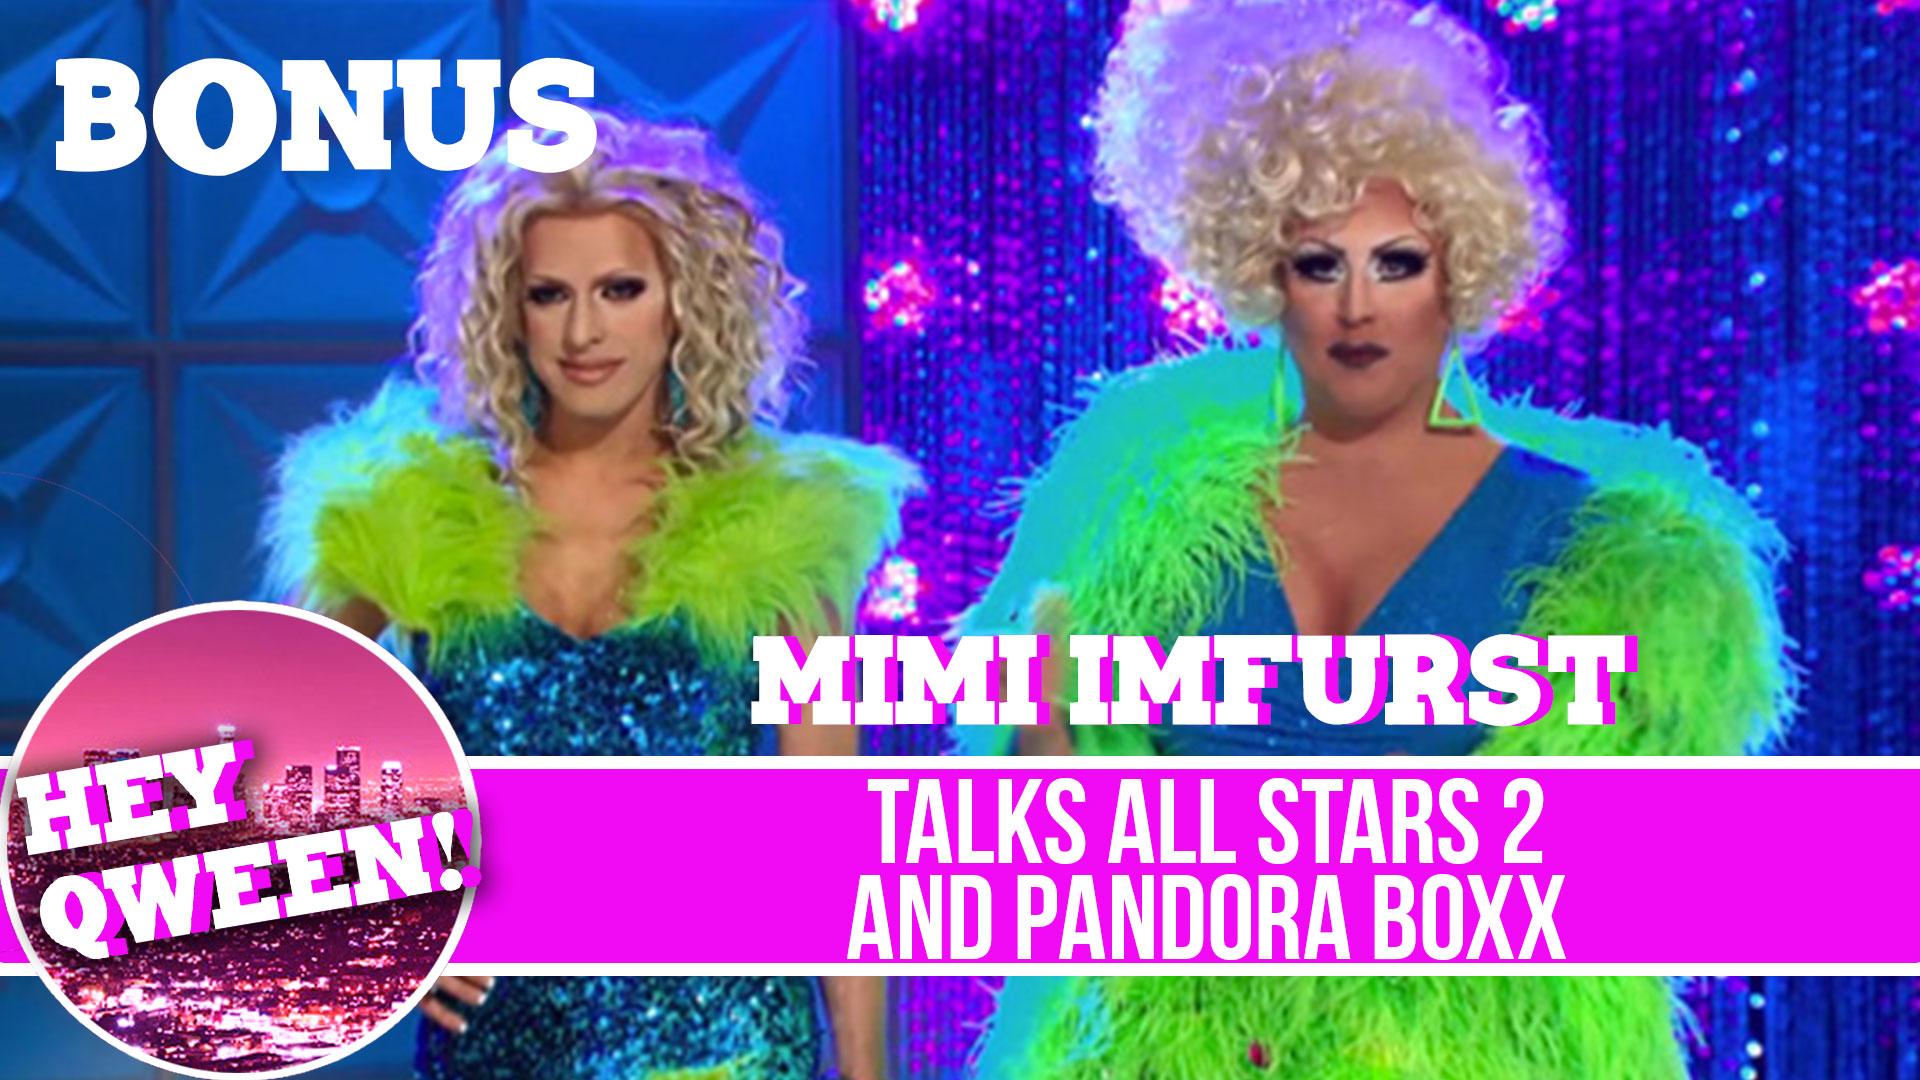 Hey Qween BONUS! Mimi Imfurst talks All Stars 2 and Pandora Boxx